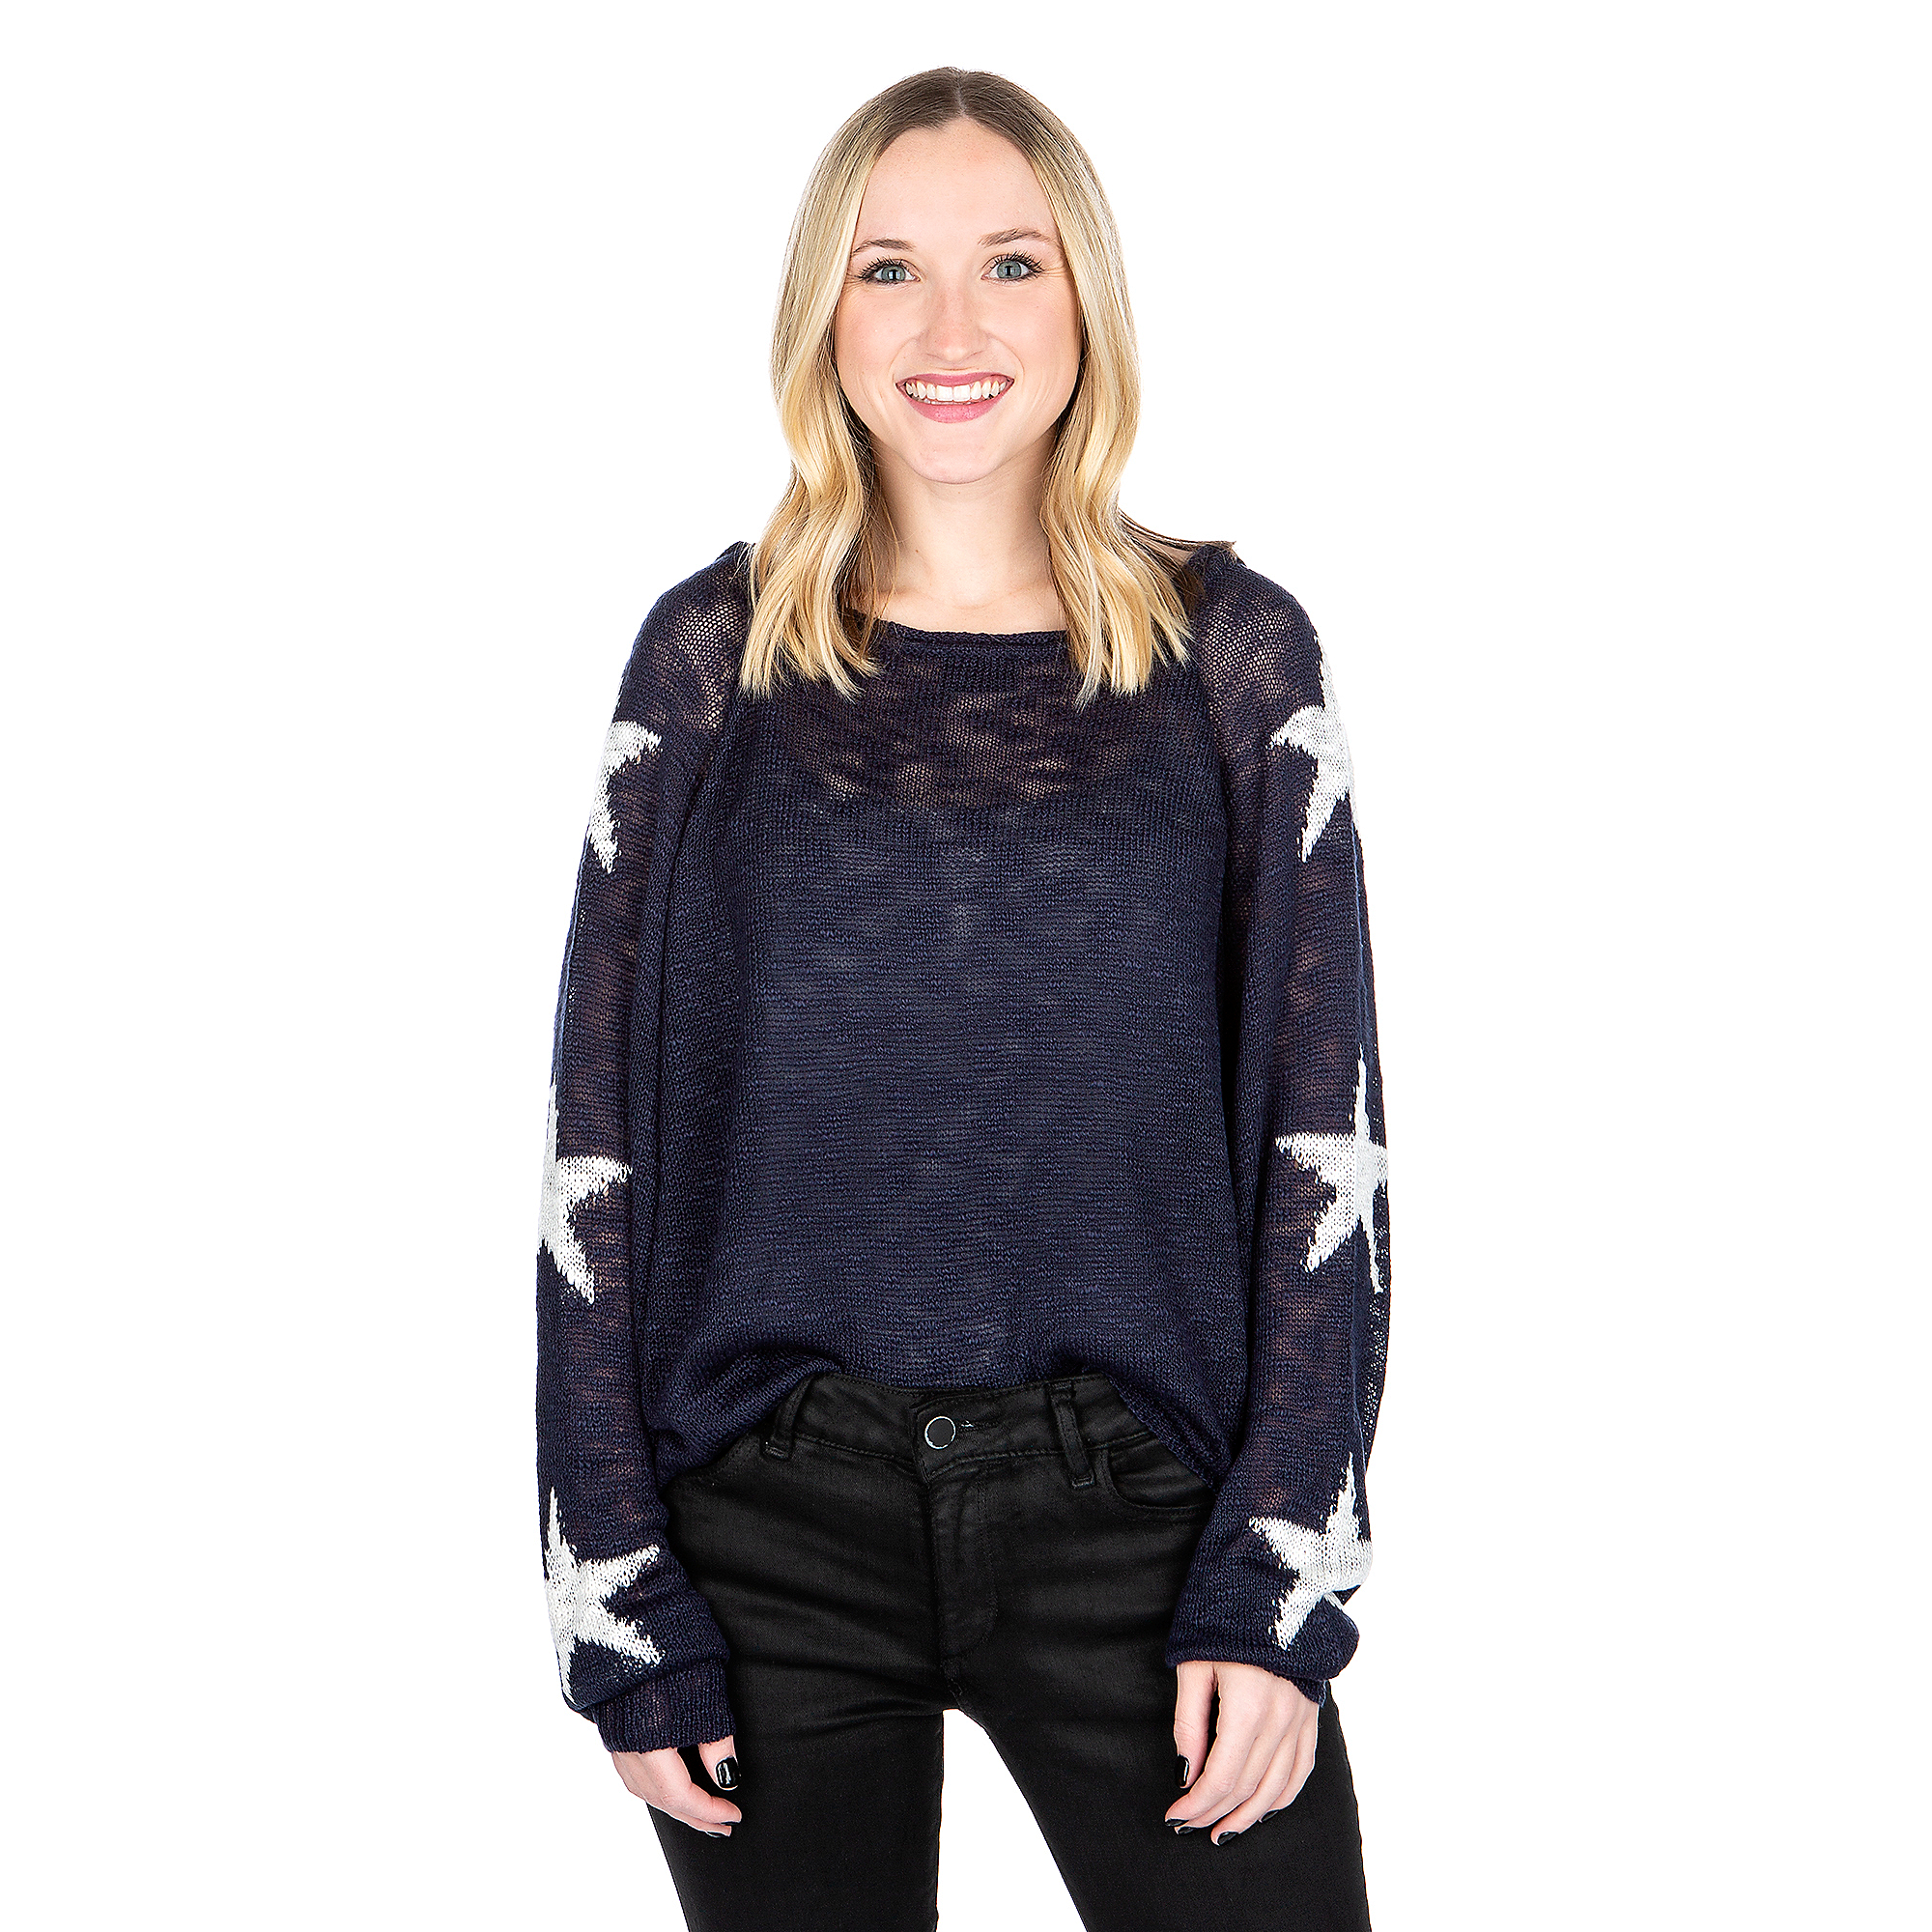 Studio Blank Paige Dark Navy White Star Sweater